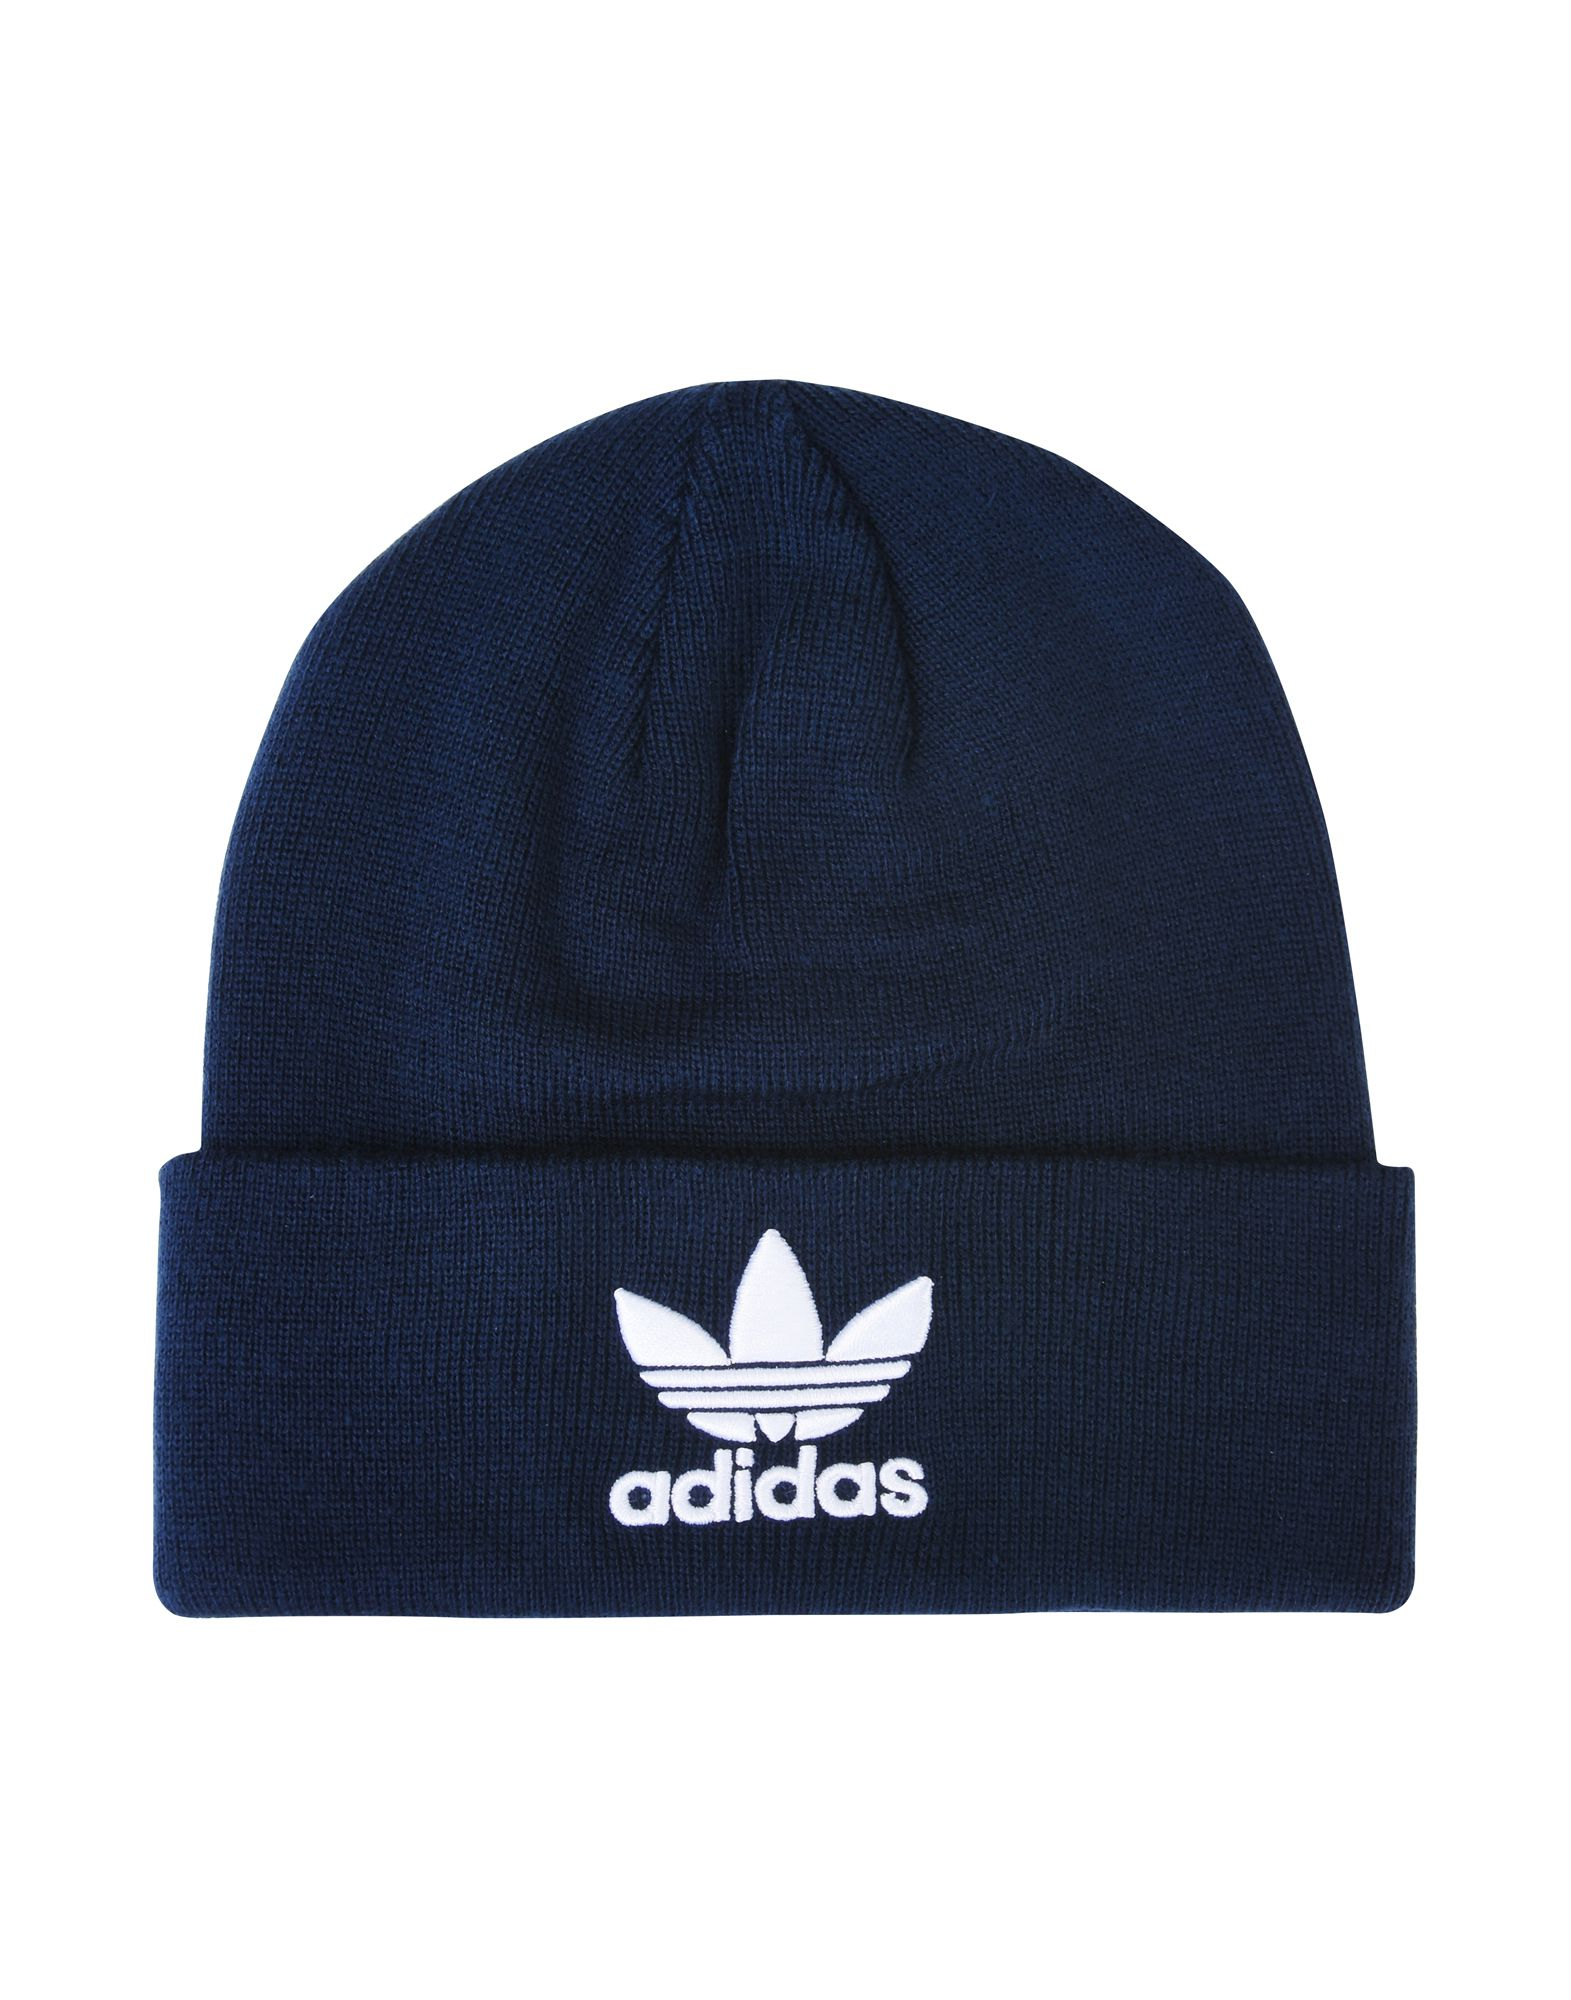 Adidas Originals Cappelli - Adidas Originals Uomo - YOOX 1257a584d64d